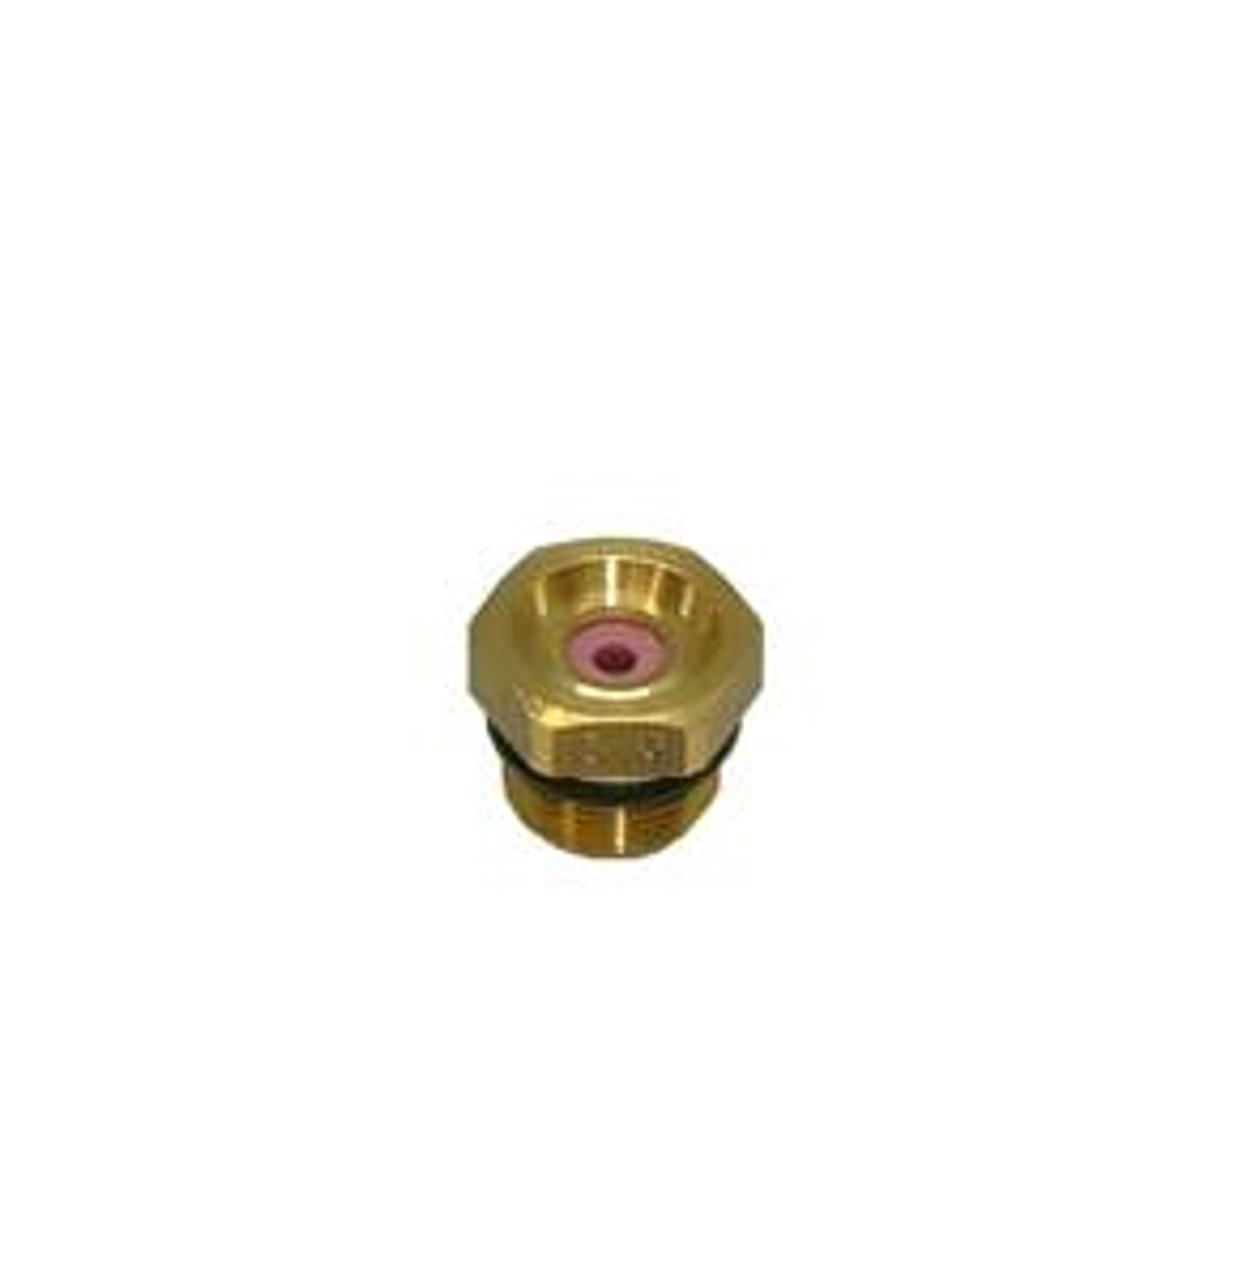 Nozzle for Turbo 400 gun - 2.3mm ceramic